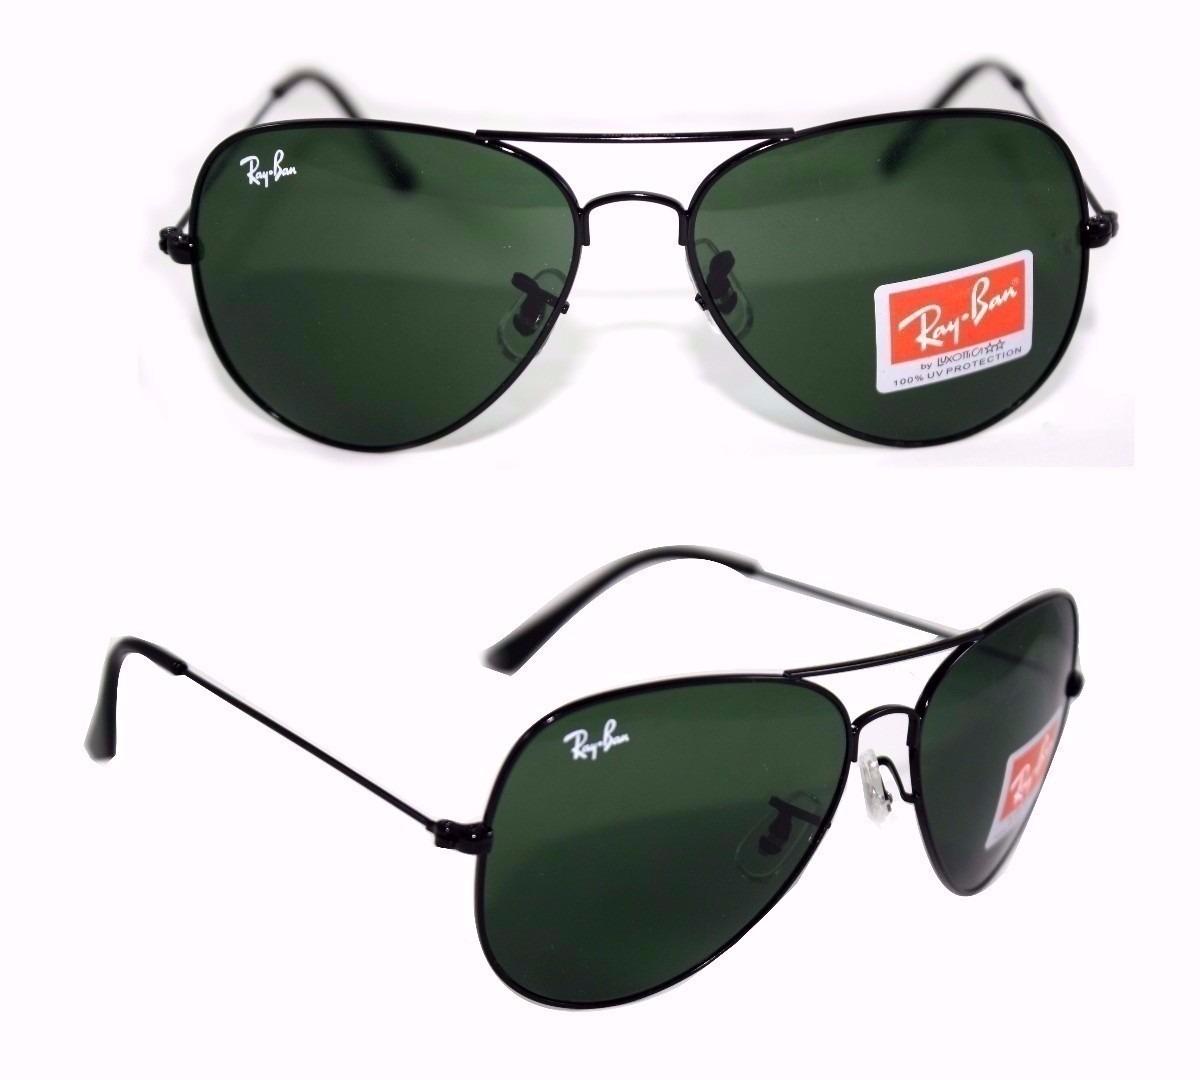 e1c5056e60756 Oculos Ray Ban Round Espelhado Replica « Heritage Malta